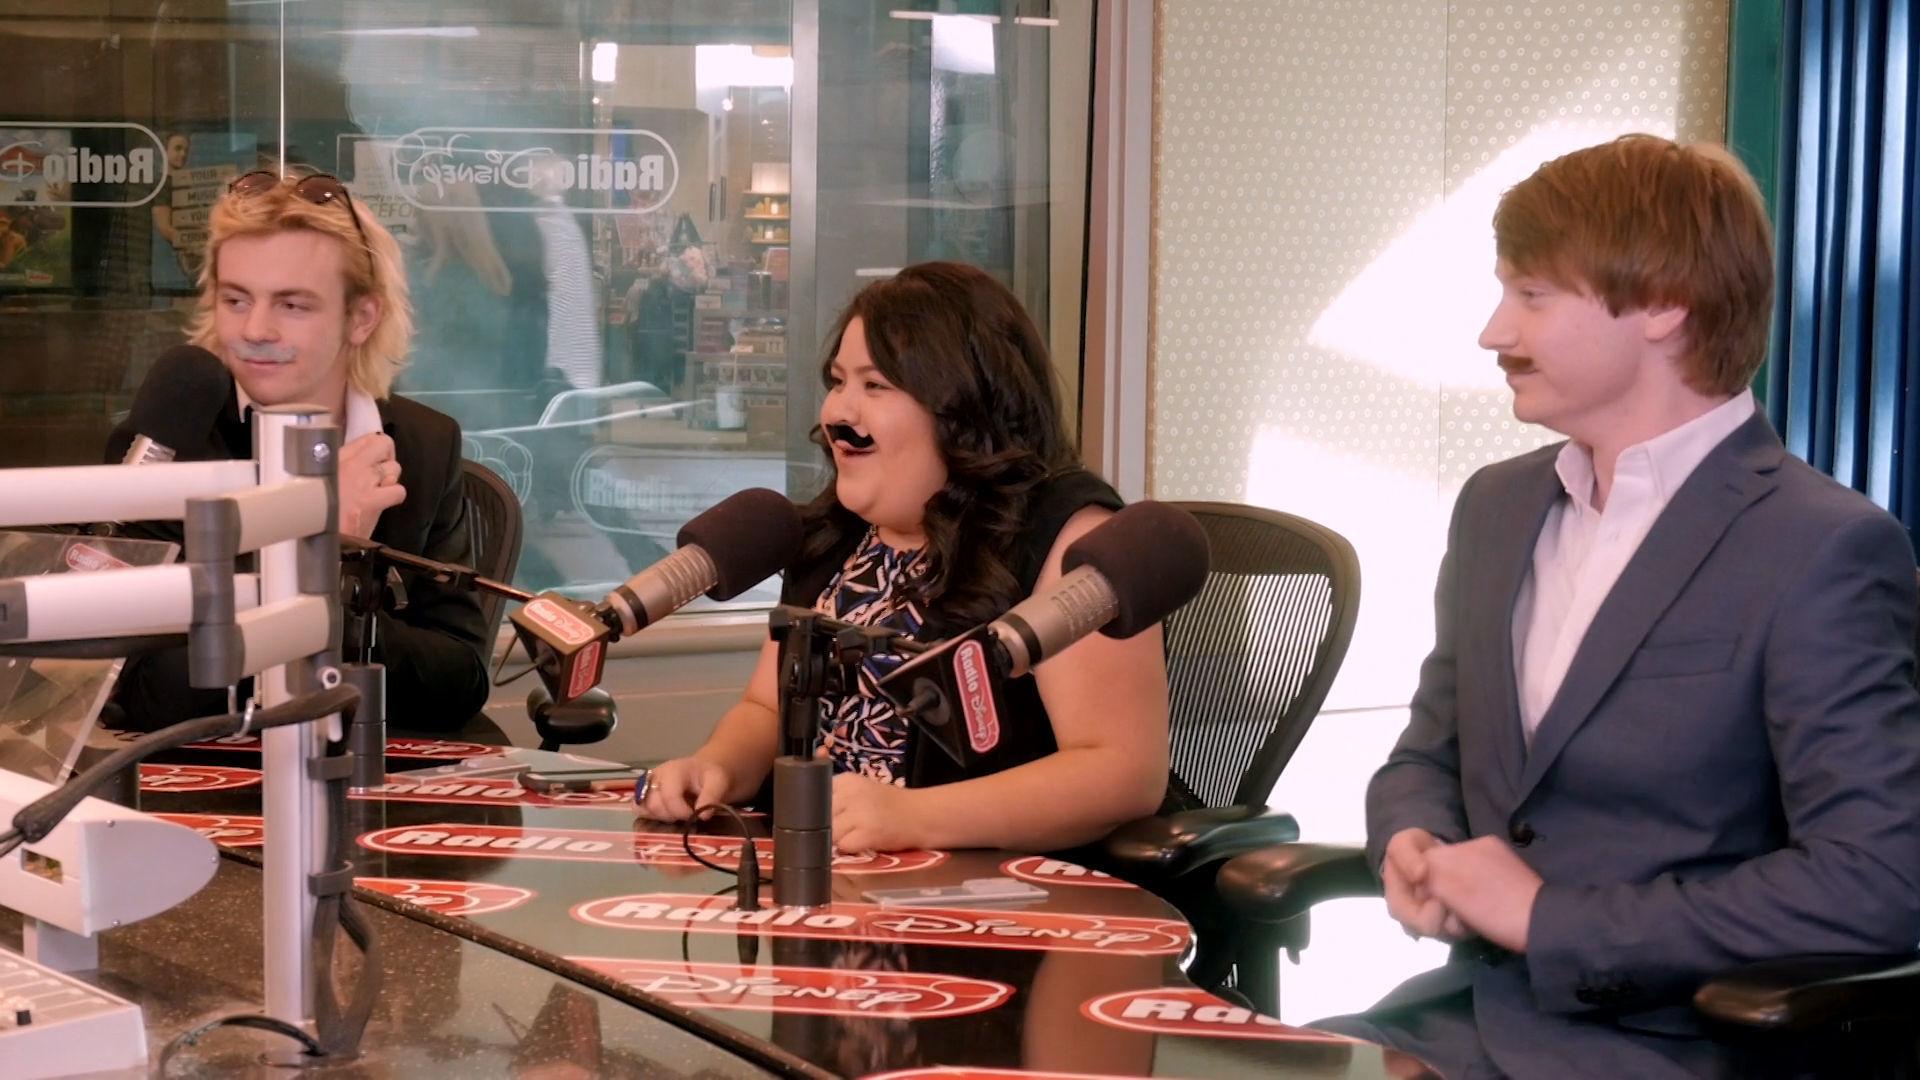 Laura Marano Interviews Her Austin & Ally Castmates